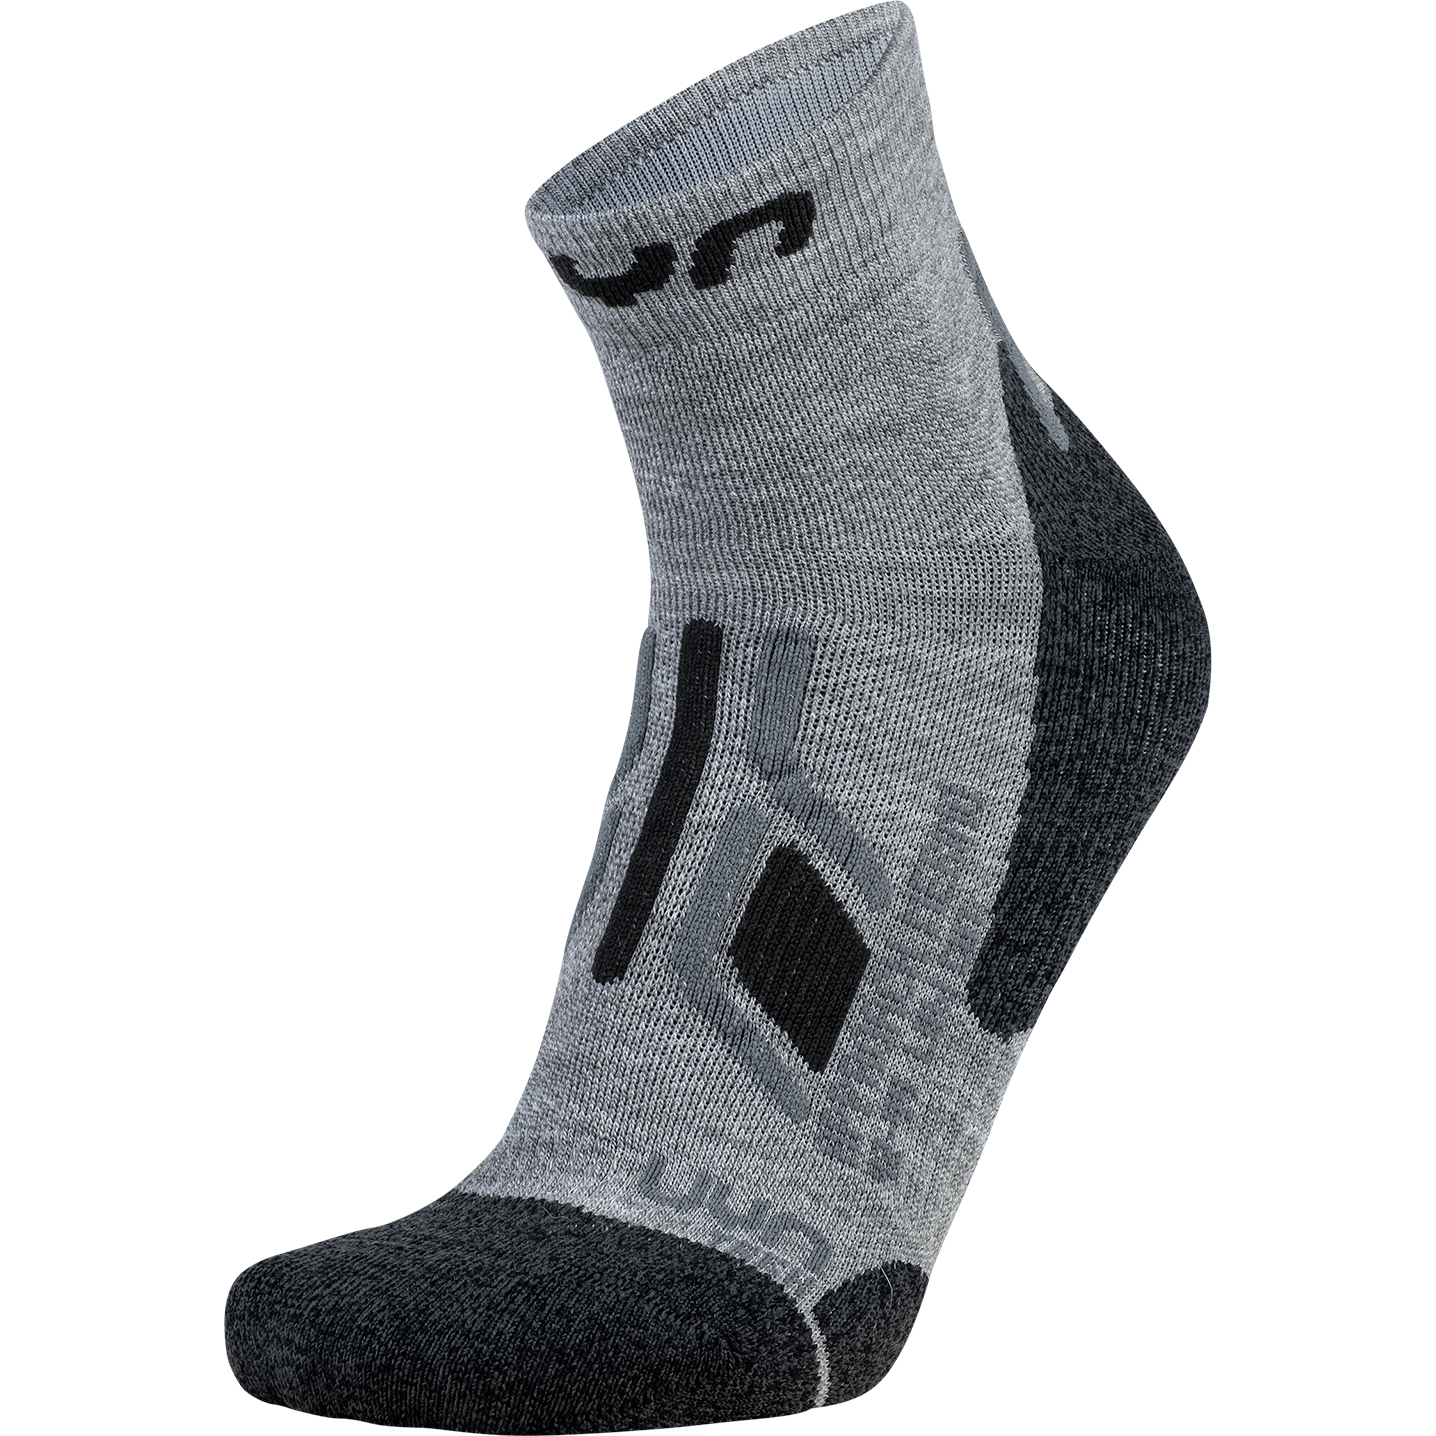 Image of UYN Man Trekking Approach Merino Low Cut Socks - Mid Grey